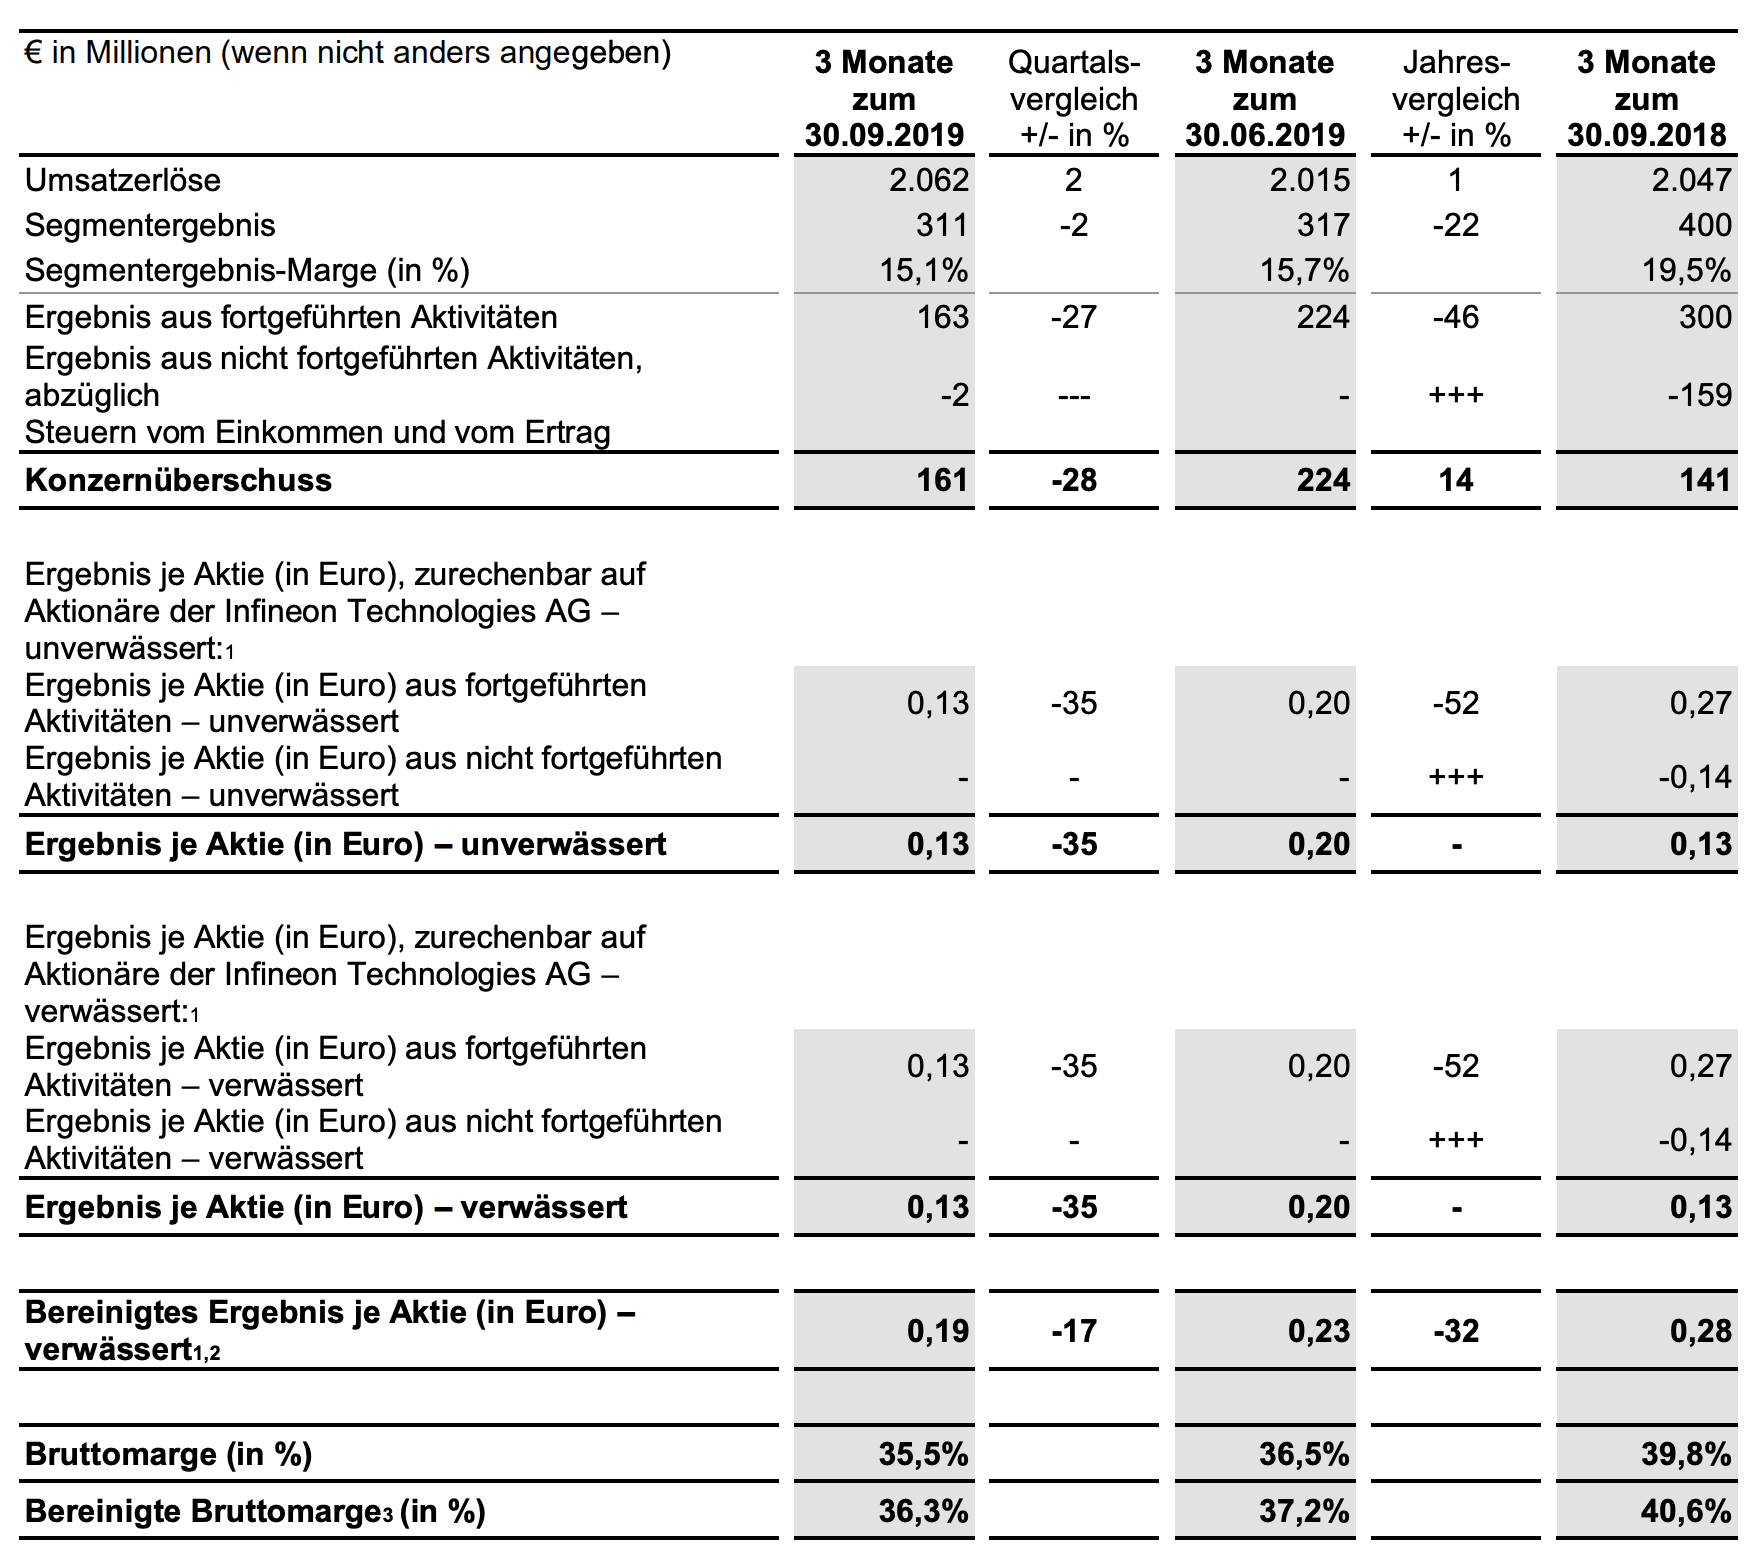 Infineon Quartalszahlen